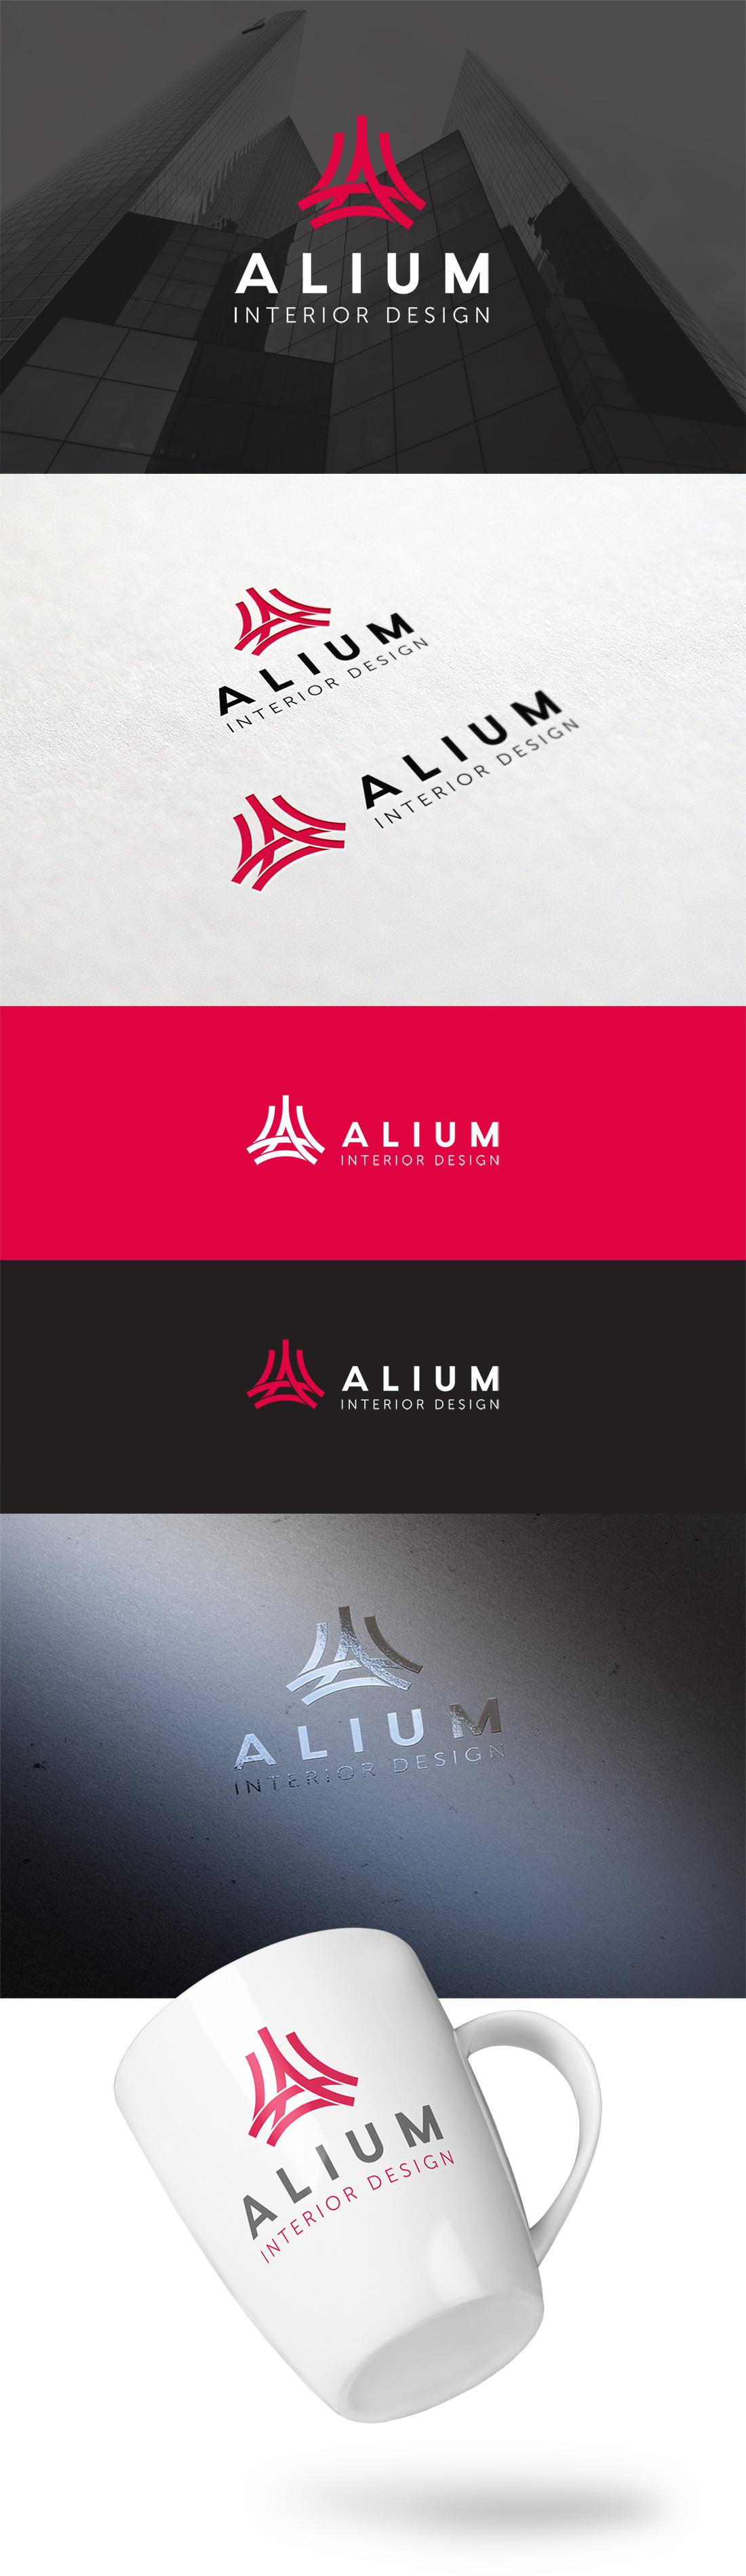 Логотип для дизайн студии фото f_70059e53e9f38c40.jpg